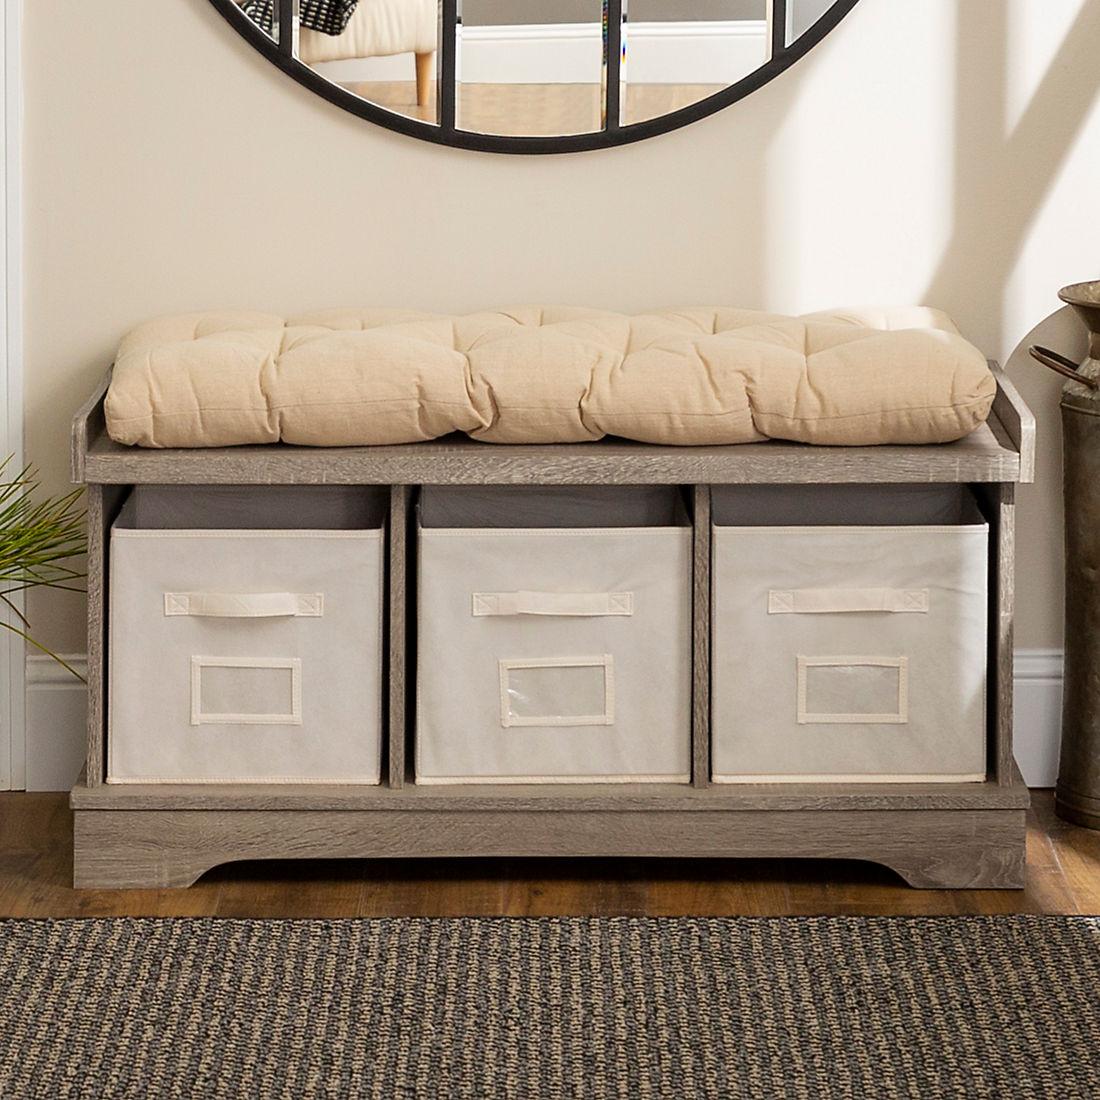 Cool 42 Farmhouse Entryway Storage Bench Driftwood Beatyapartments Chair Design Images Beatyapartmentscom